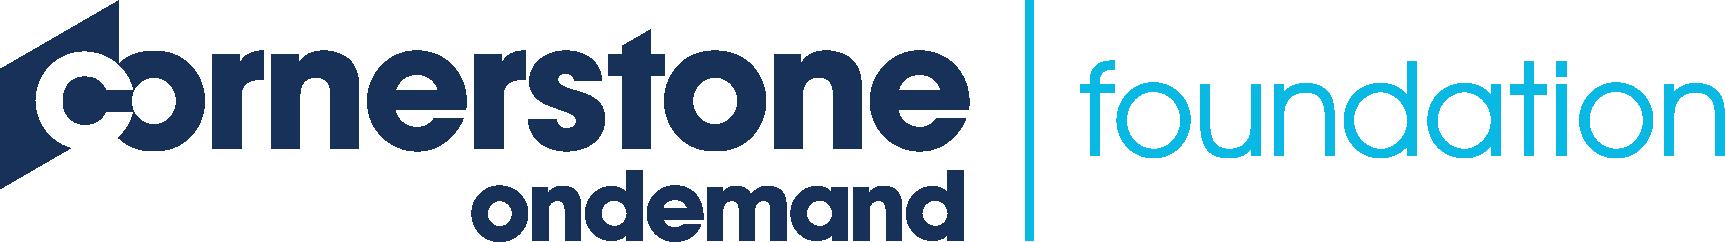 Cornerstone OnDemand Foundation